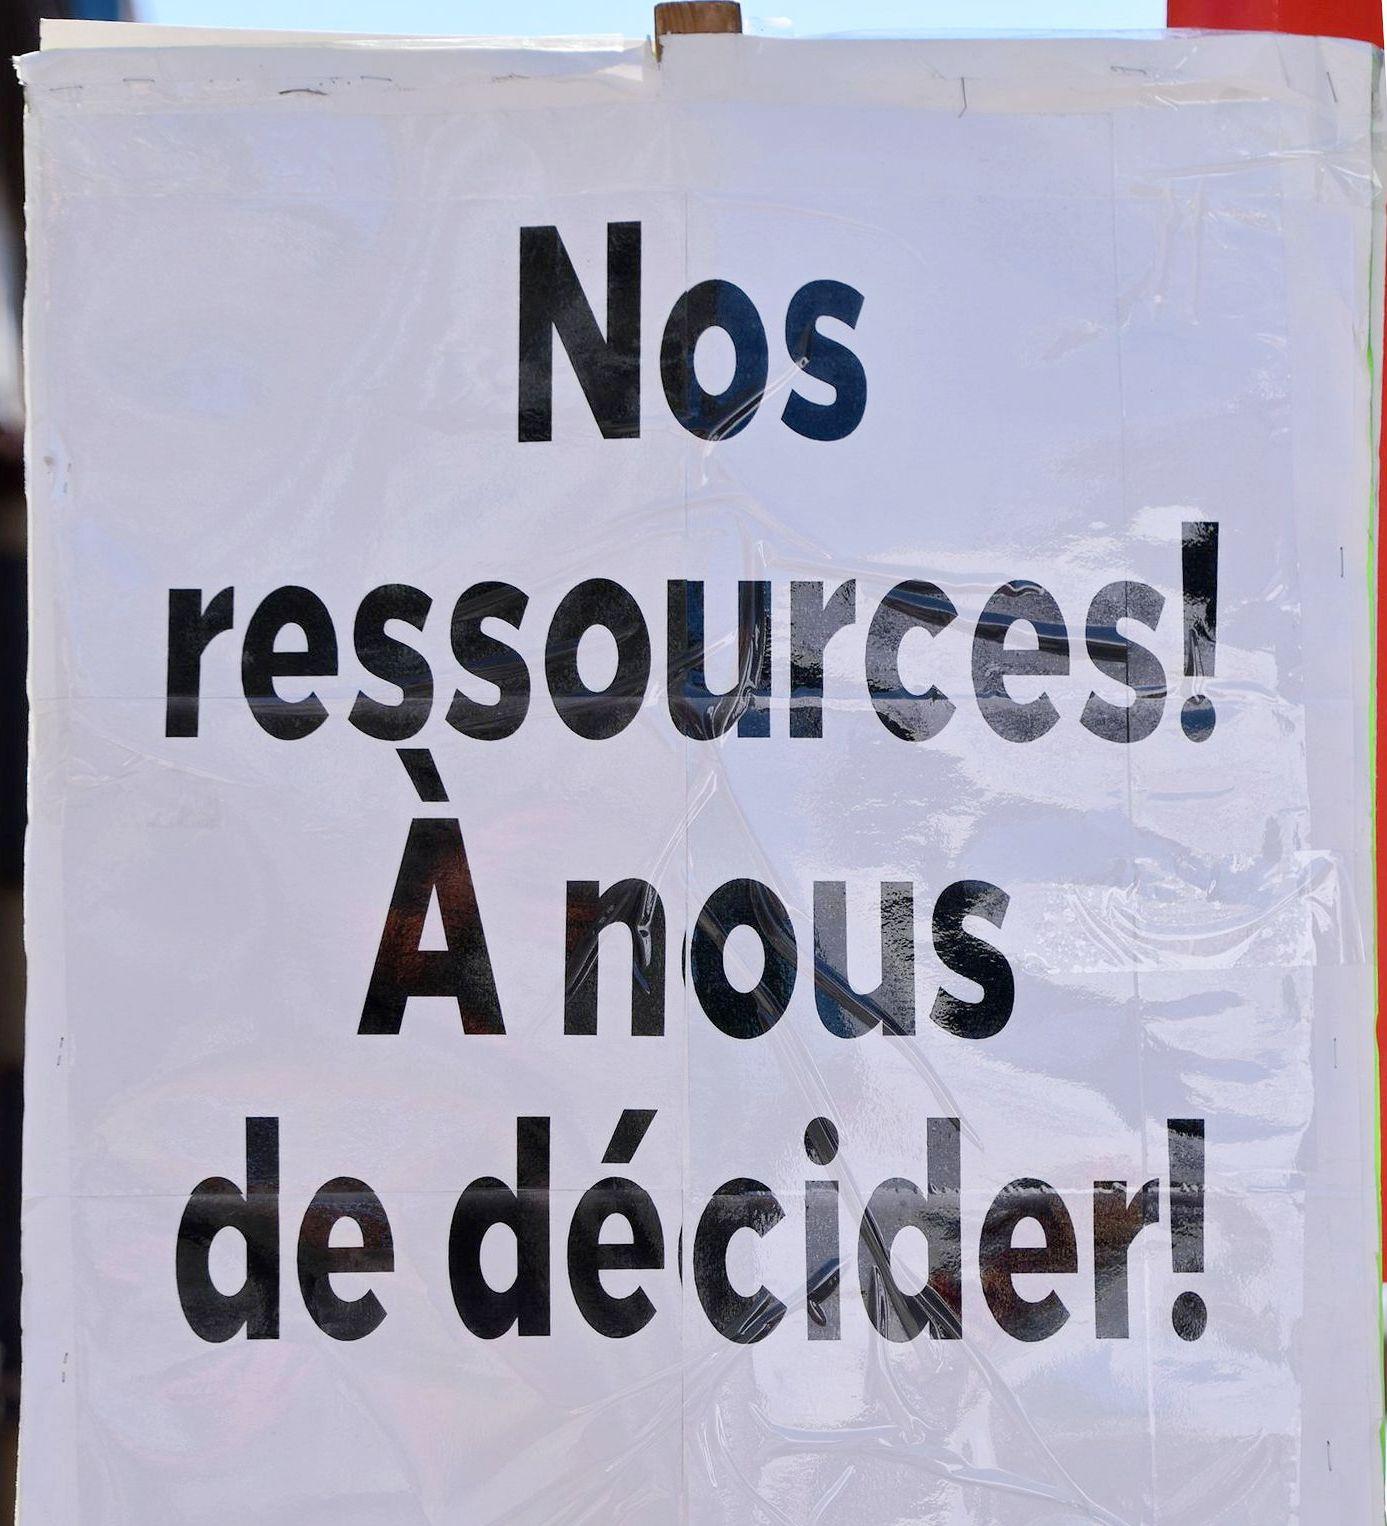 http://www.cpcml.ca/francais/Images2018/Slogans/180609-MTL-G7G7Quebec-05cr.jpg